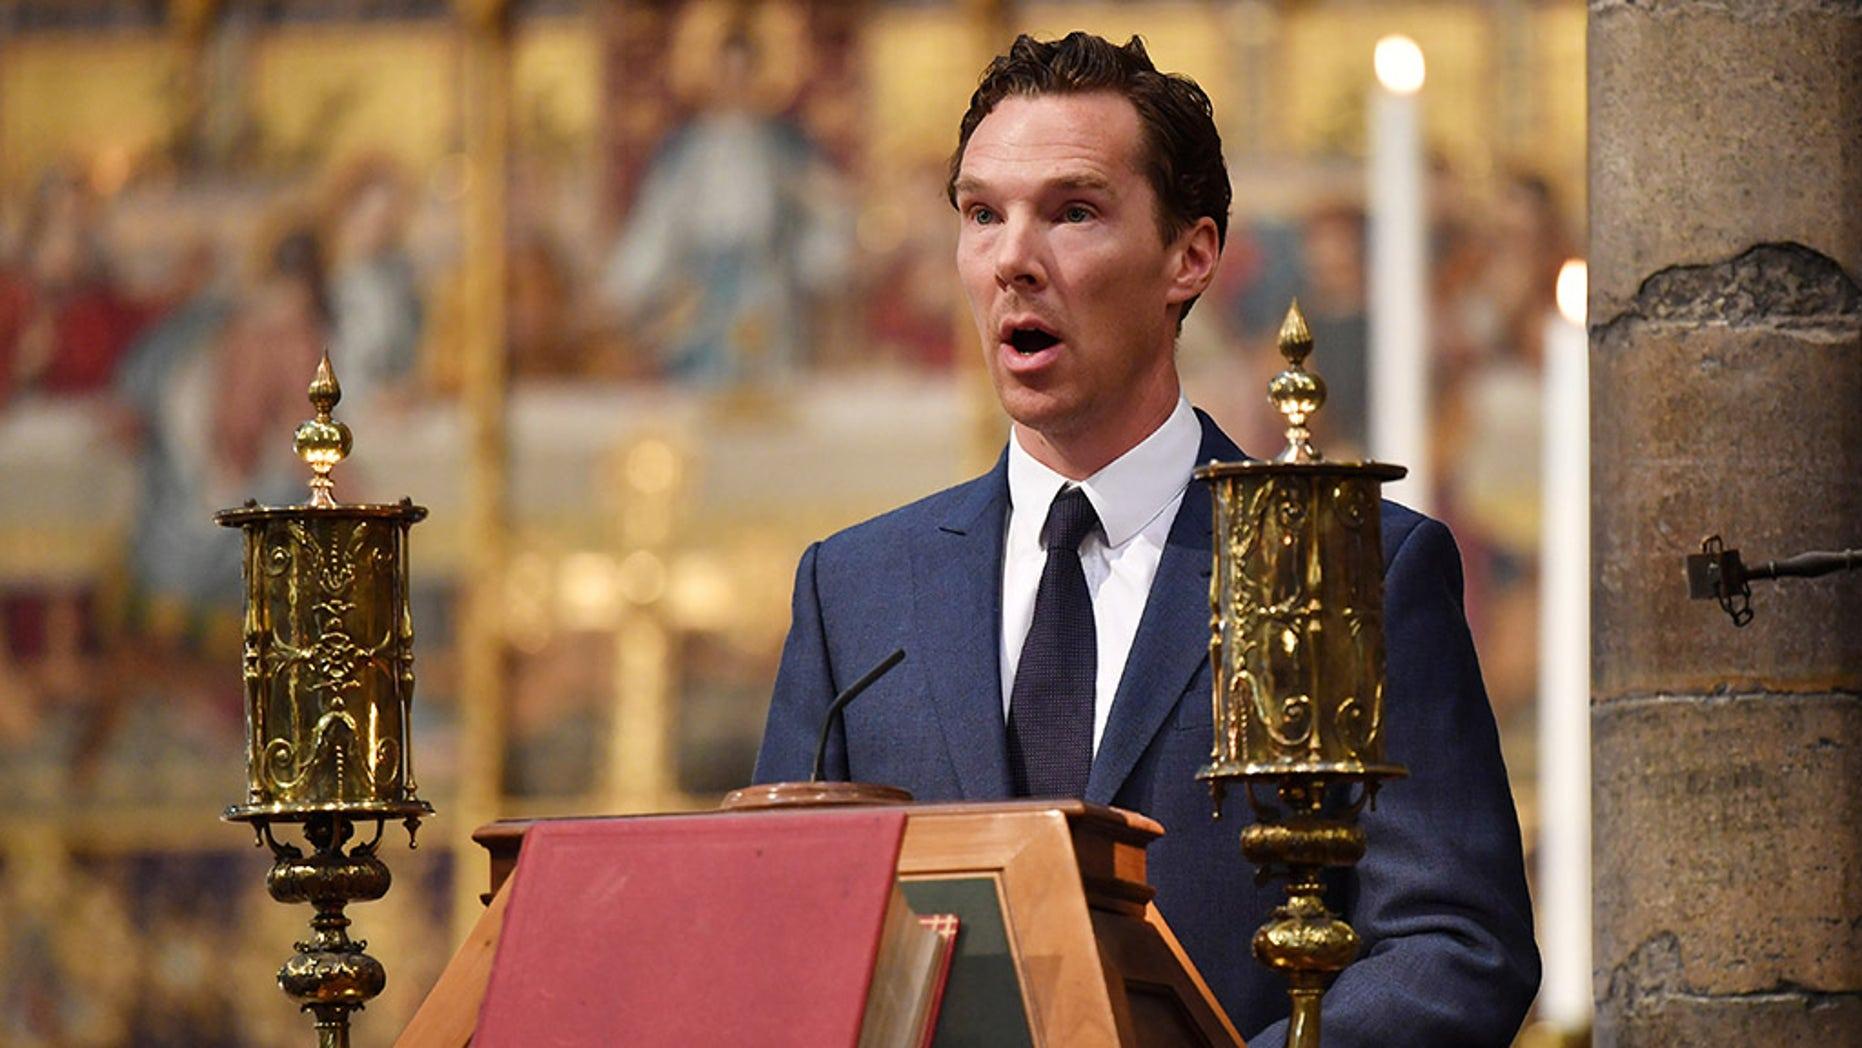 Avtor Benedict Cumberbatch speaks at Professor Stephen Hawking's memorial service at Westminster Abbey on June 15, 2018 in London, England.